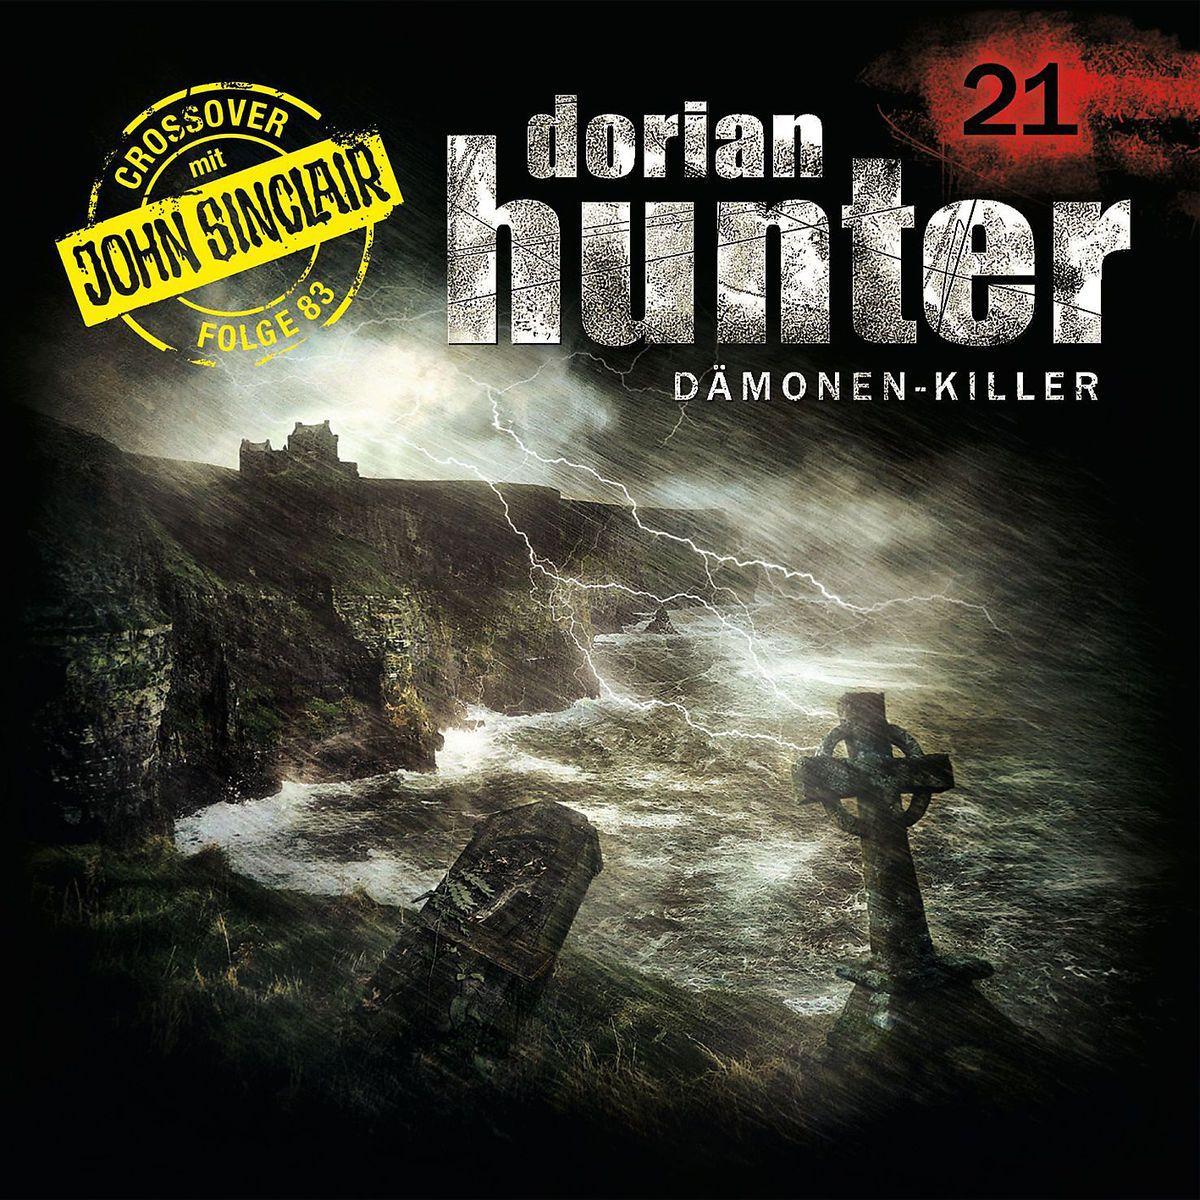 Geisterjäger trifft Dämonenkiller - John Sinclair & Dorian Hunter